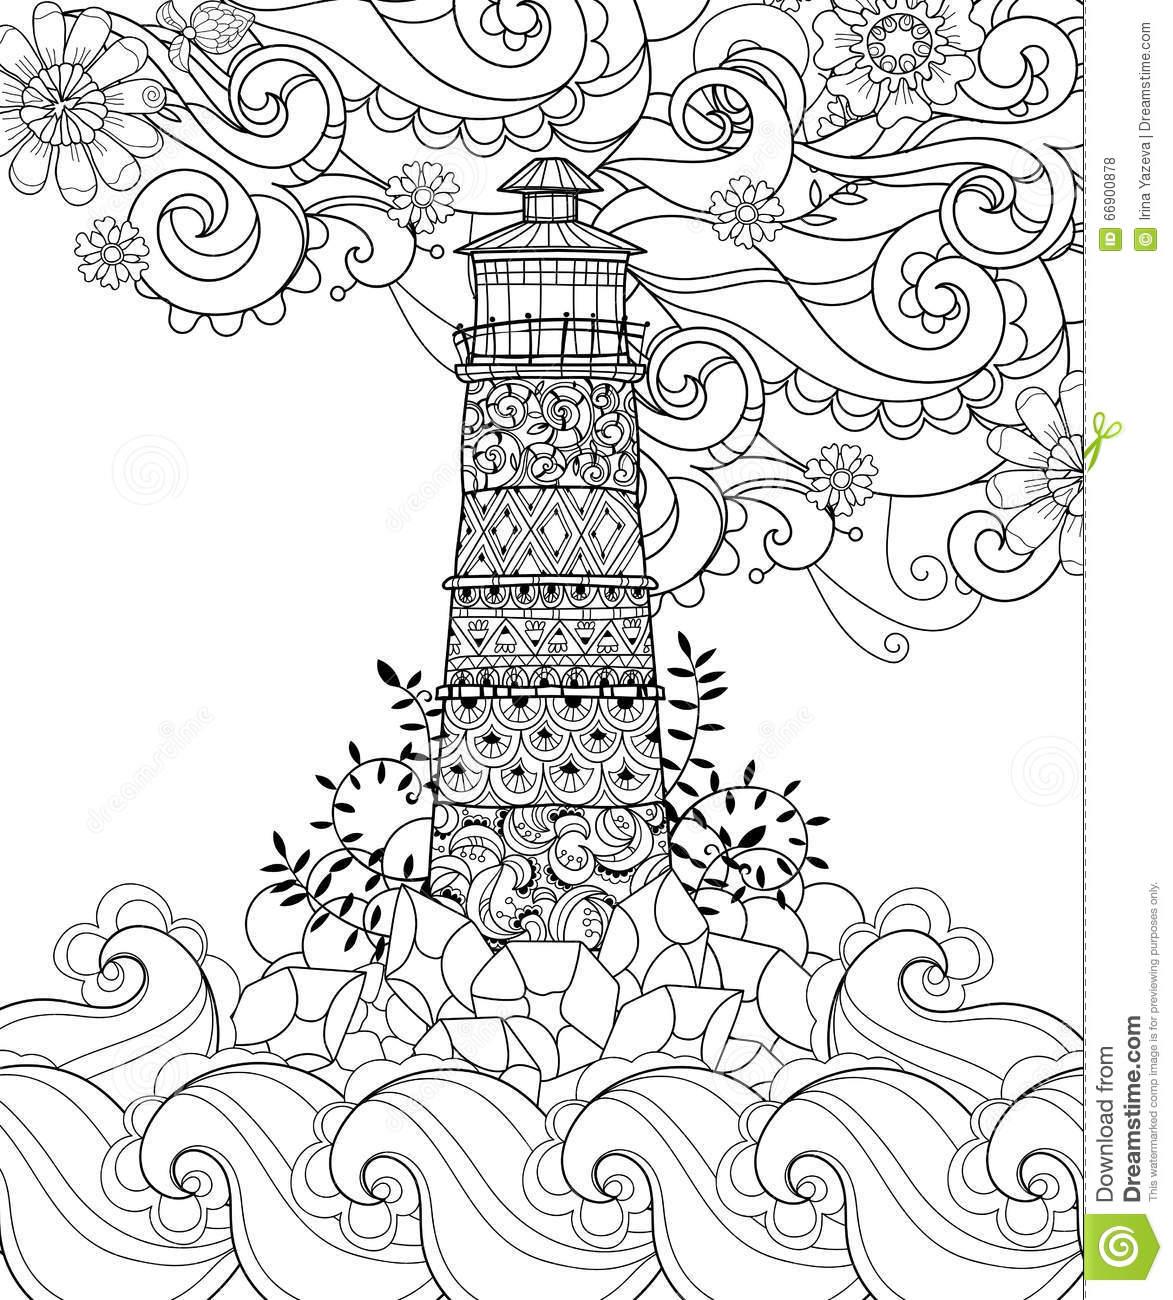 1173x1300 Drawn Lighthouse Doodle